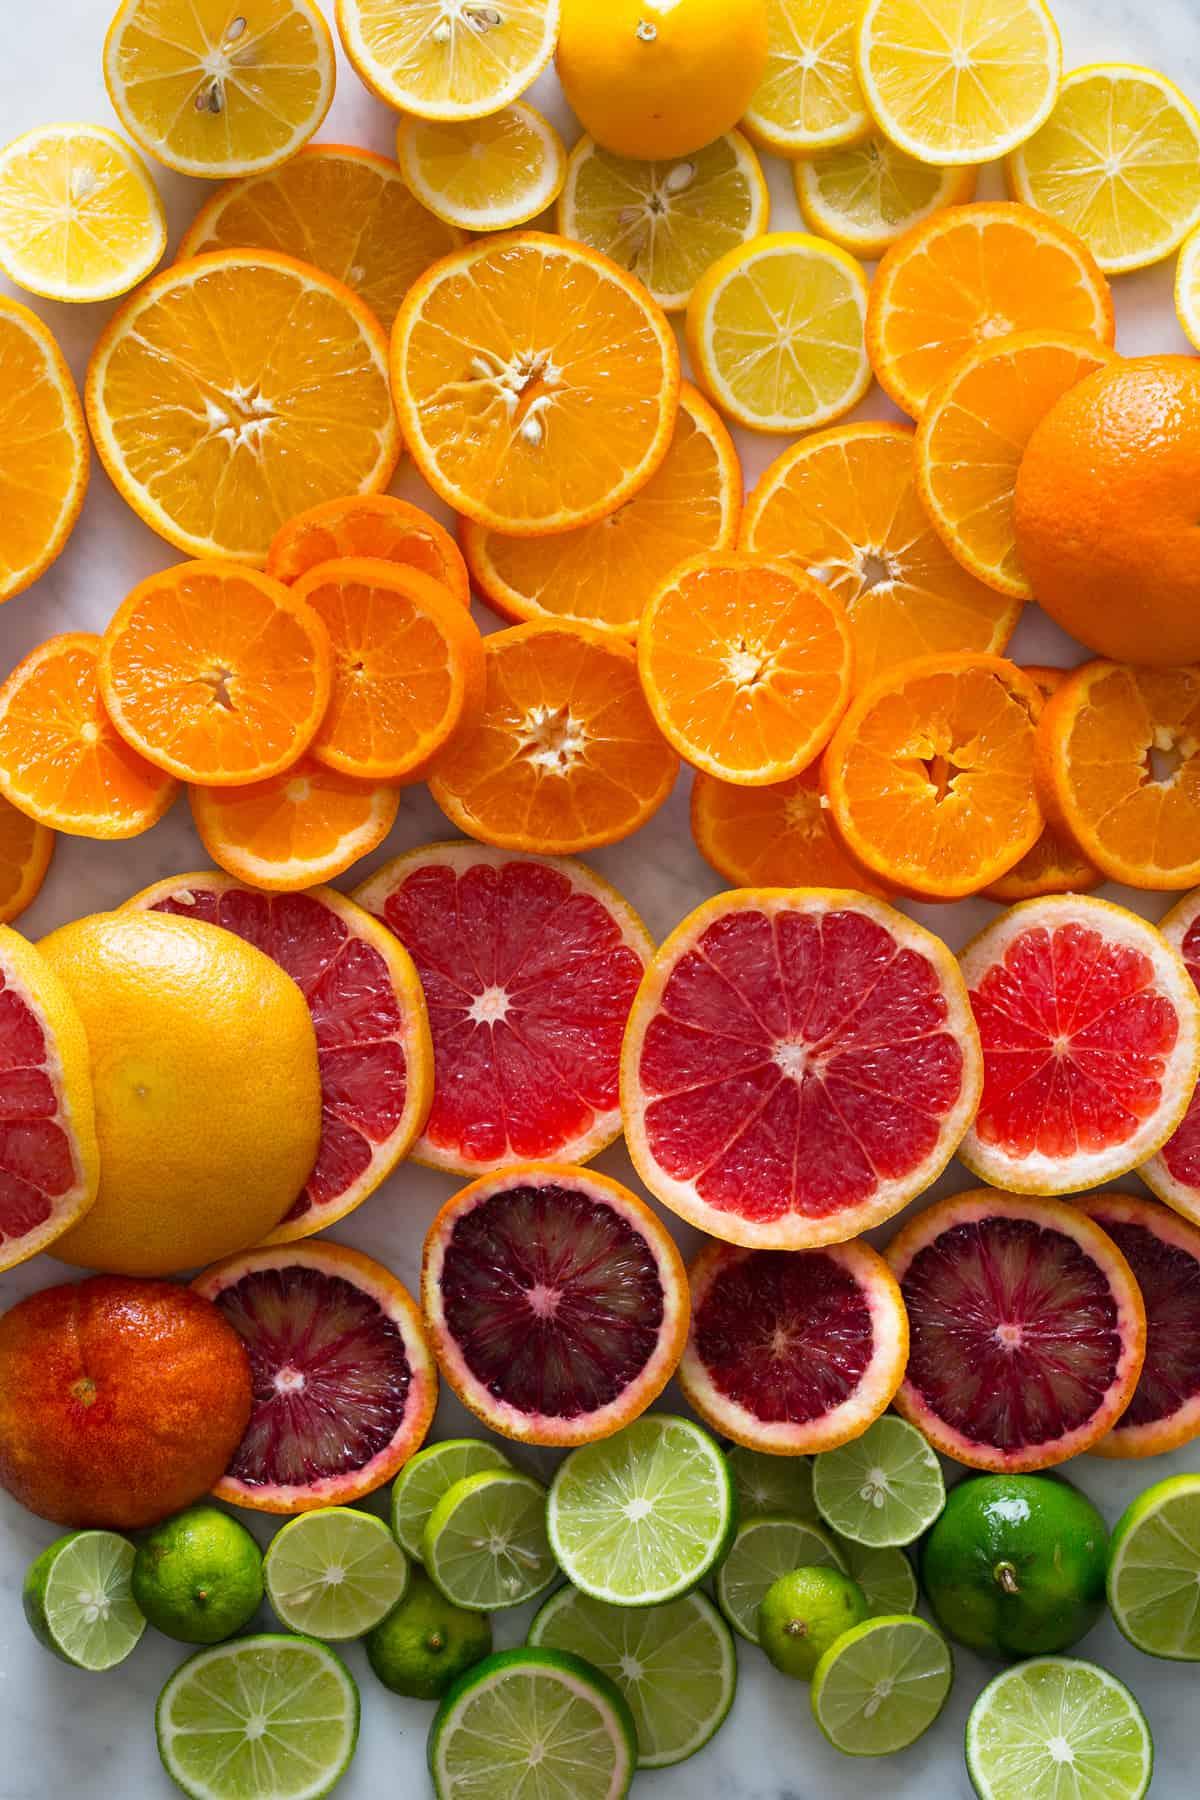 is dried fruit healthy orange fruit